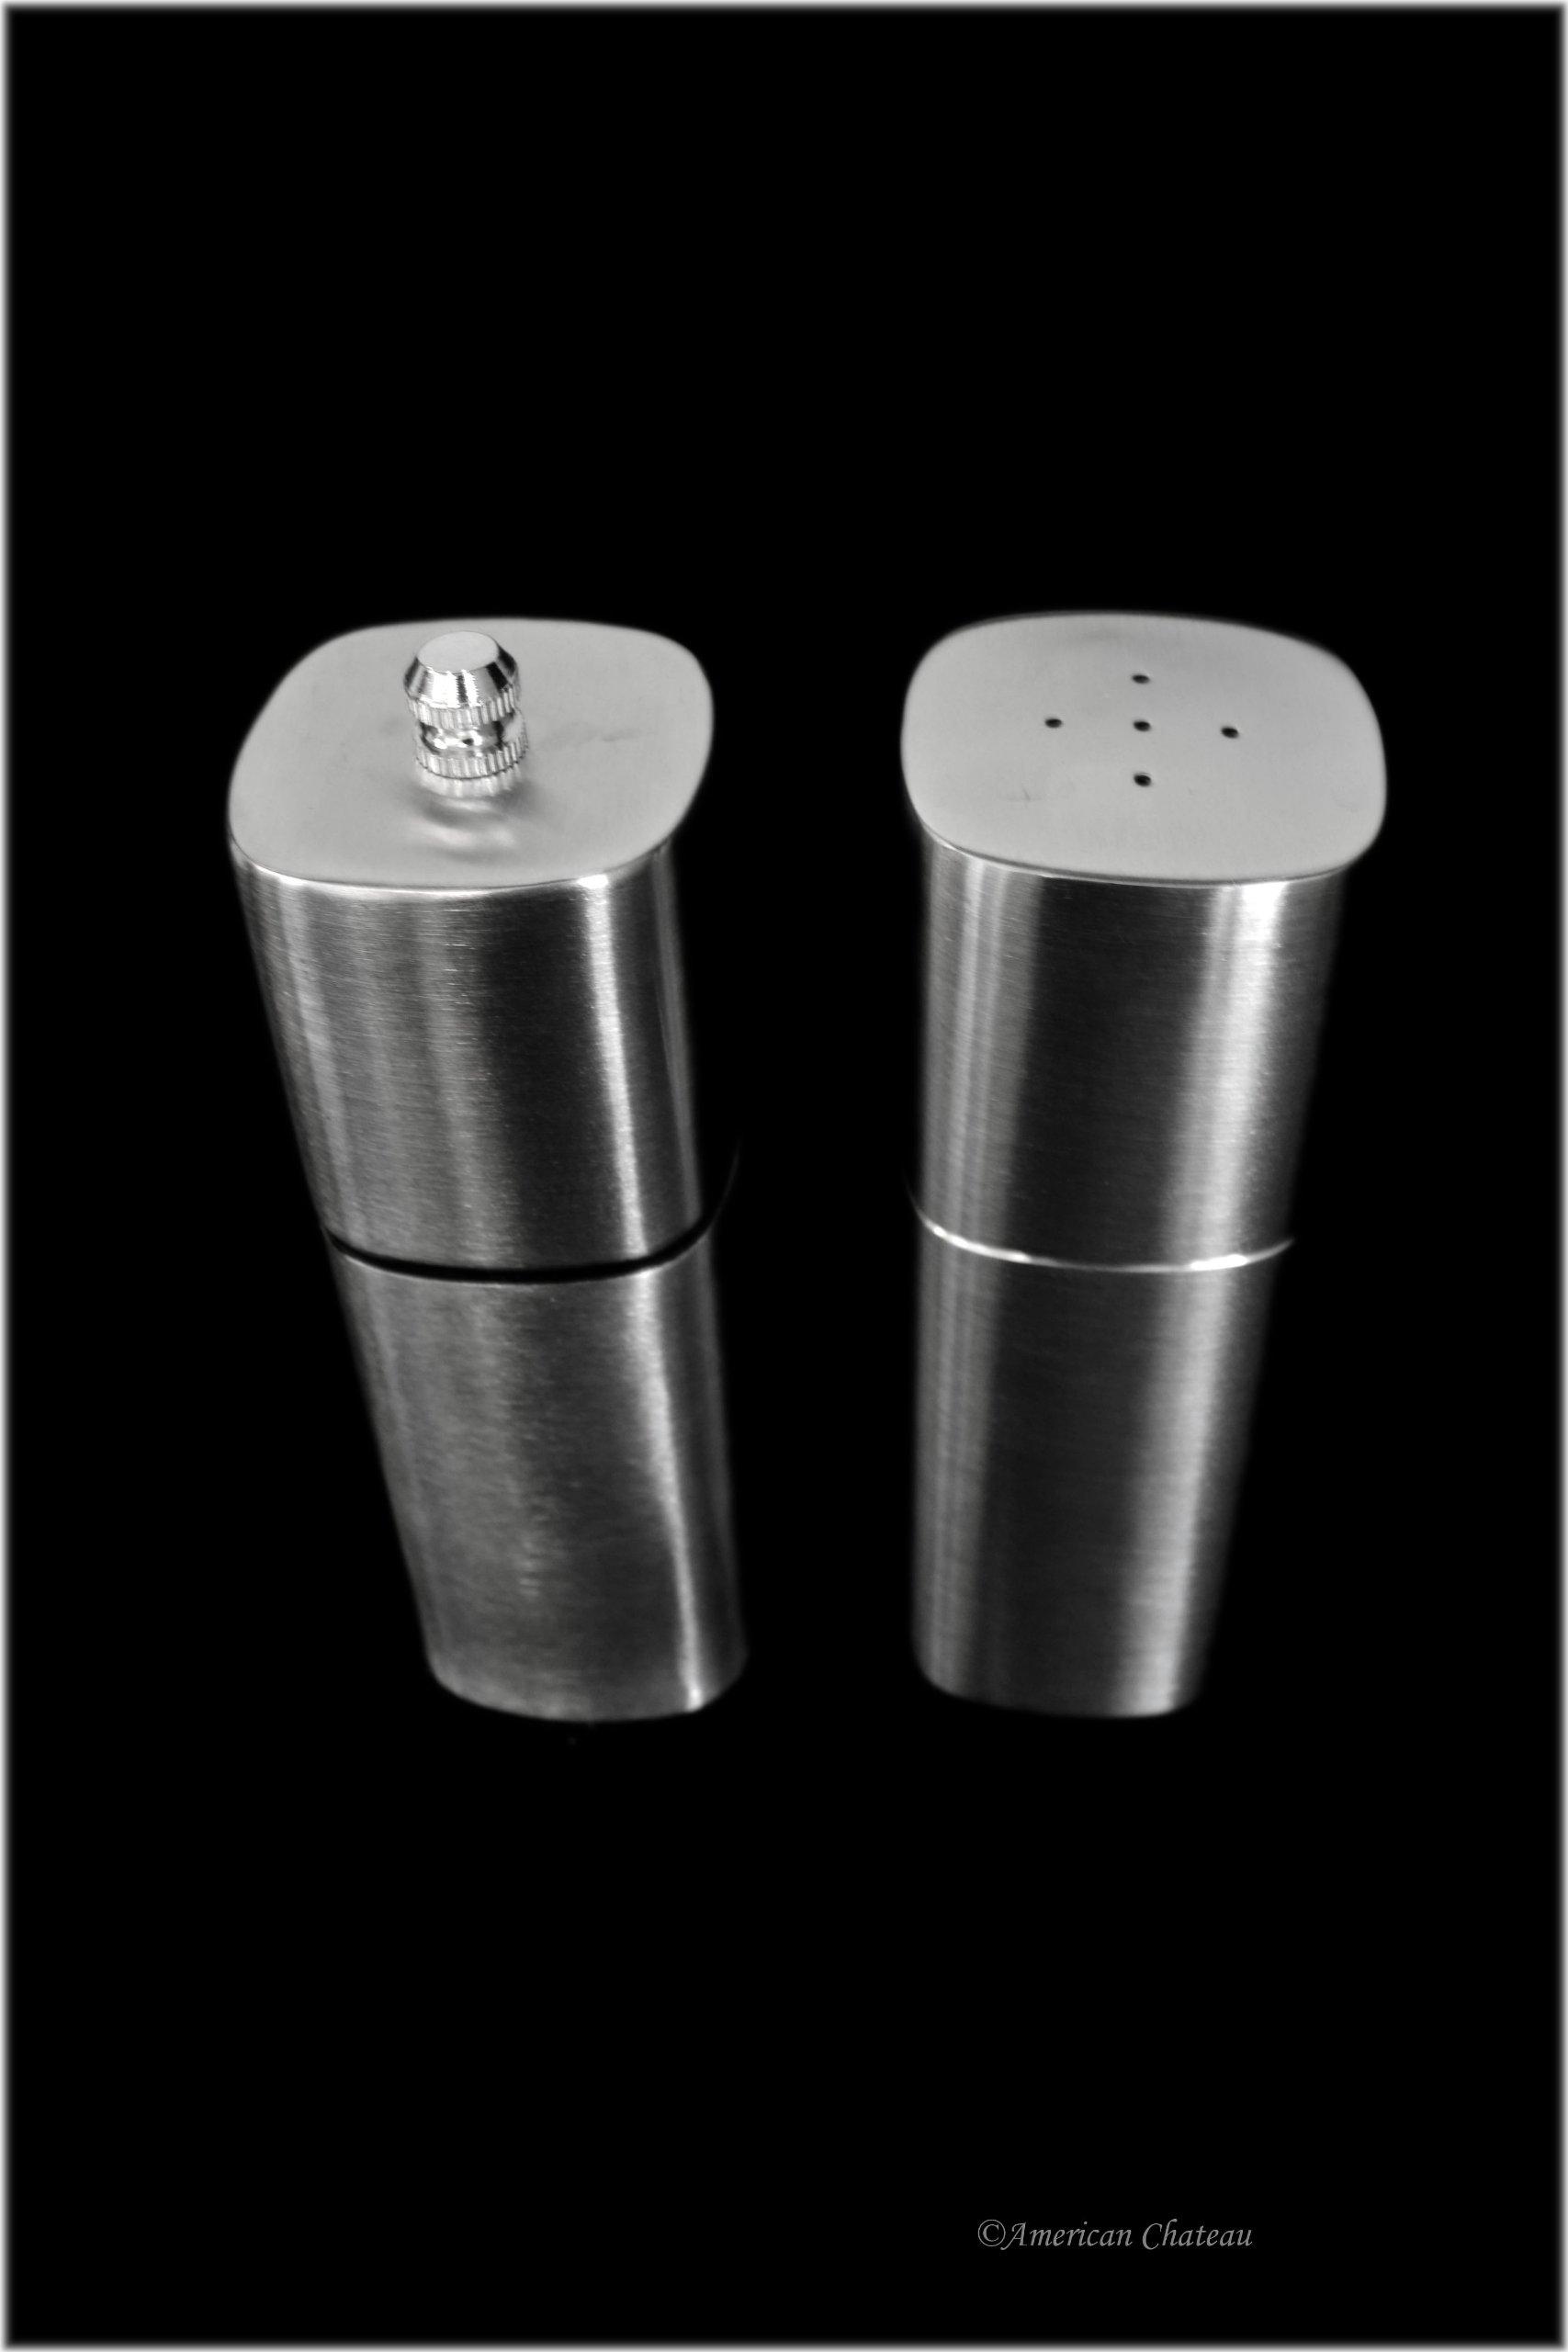 Set Square Restaurant-Style Stainless Steel Salt Shaker and Pepper Mill Grinder